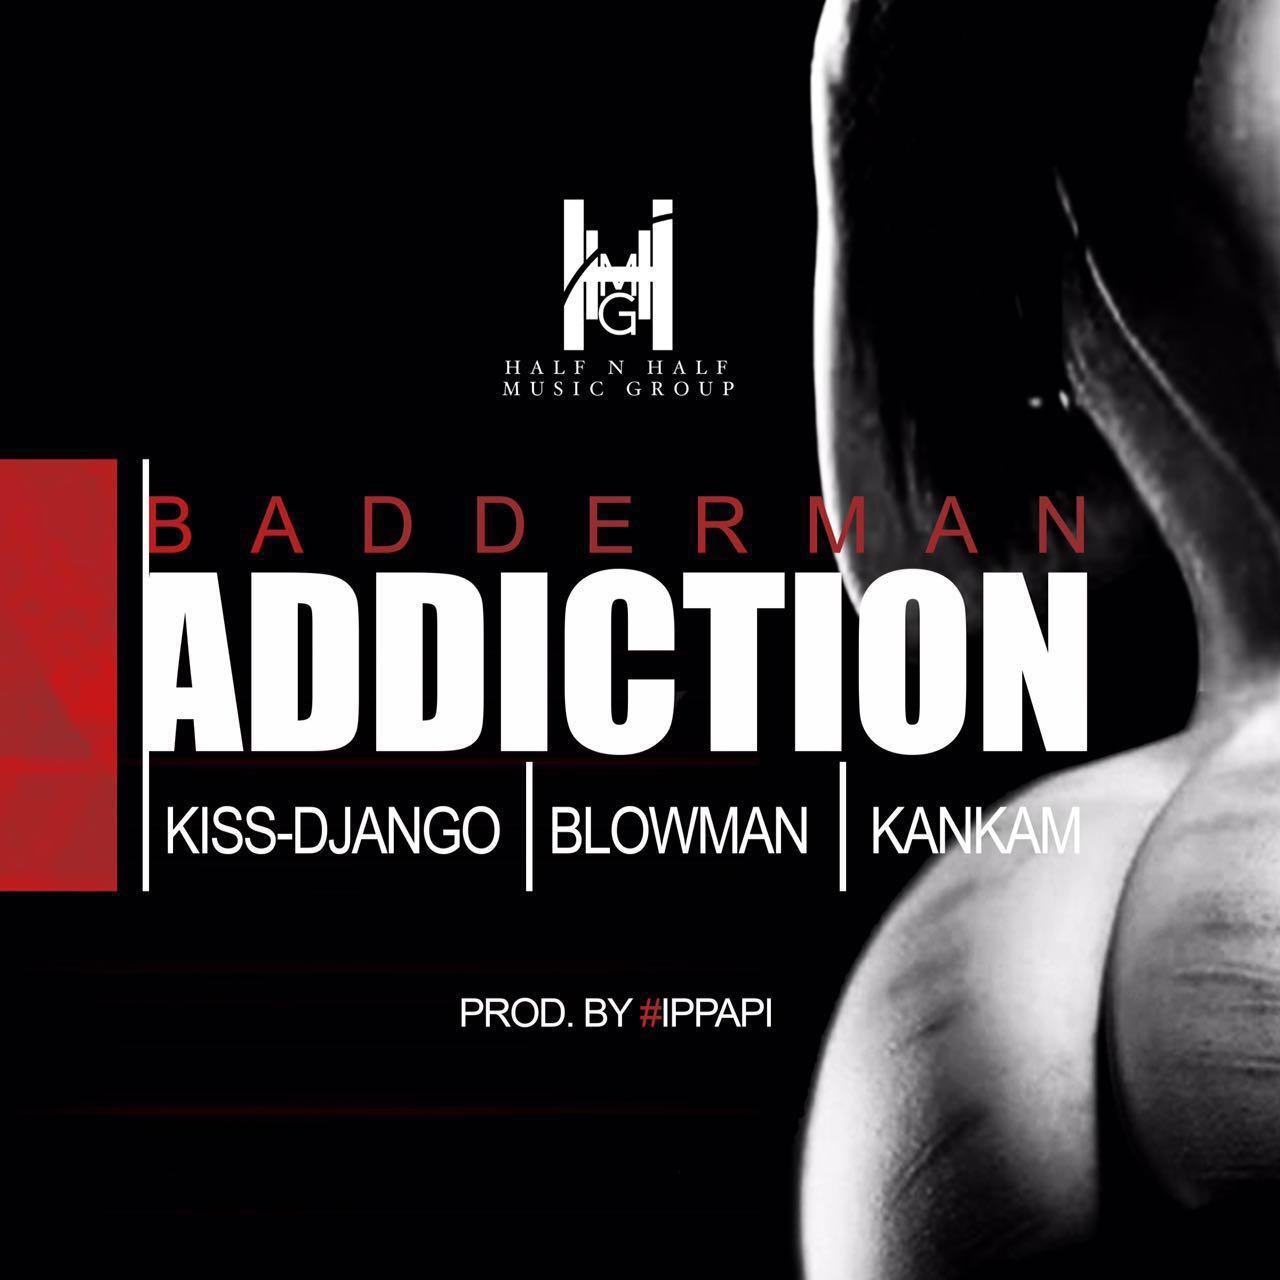 HHMG - Badderman Addiction (Produced by iPappi)